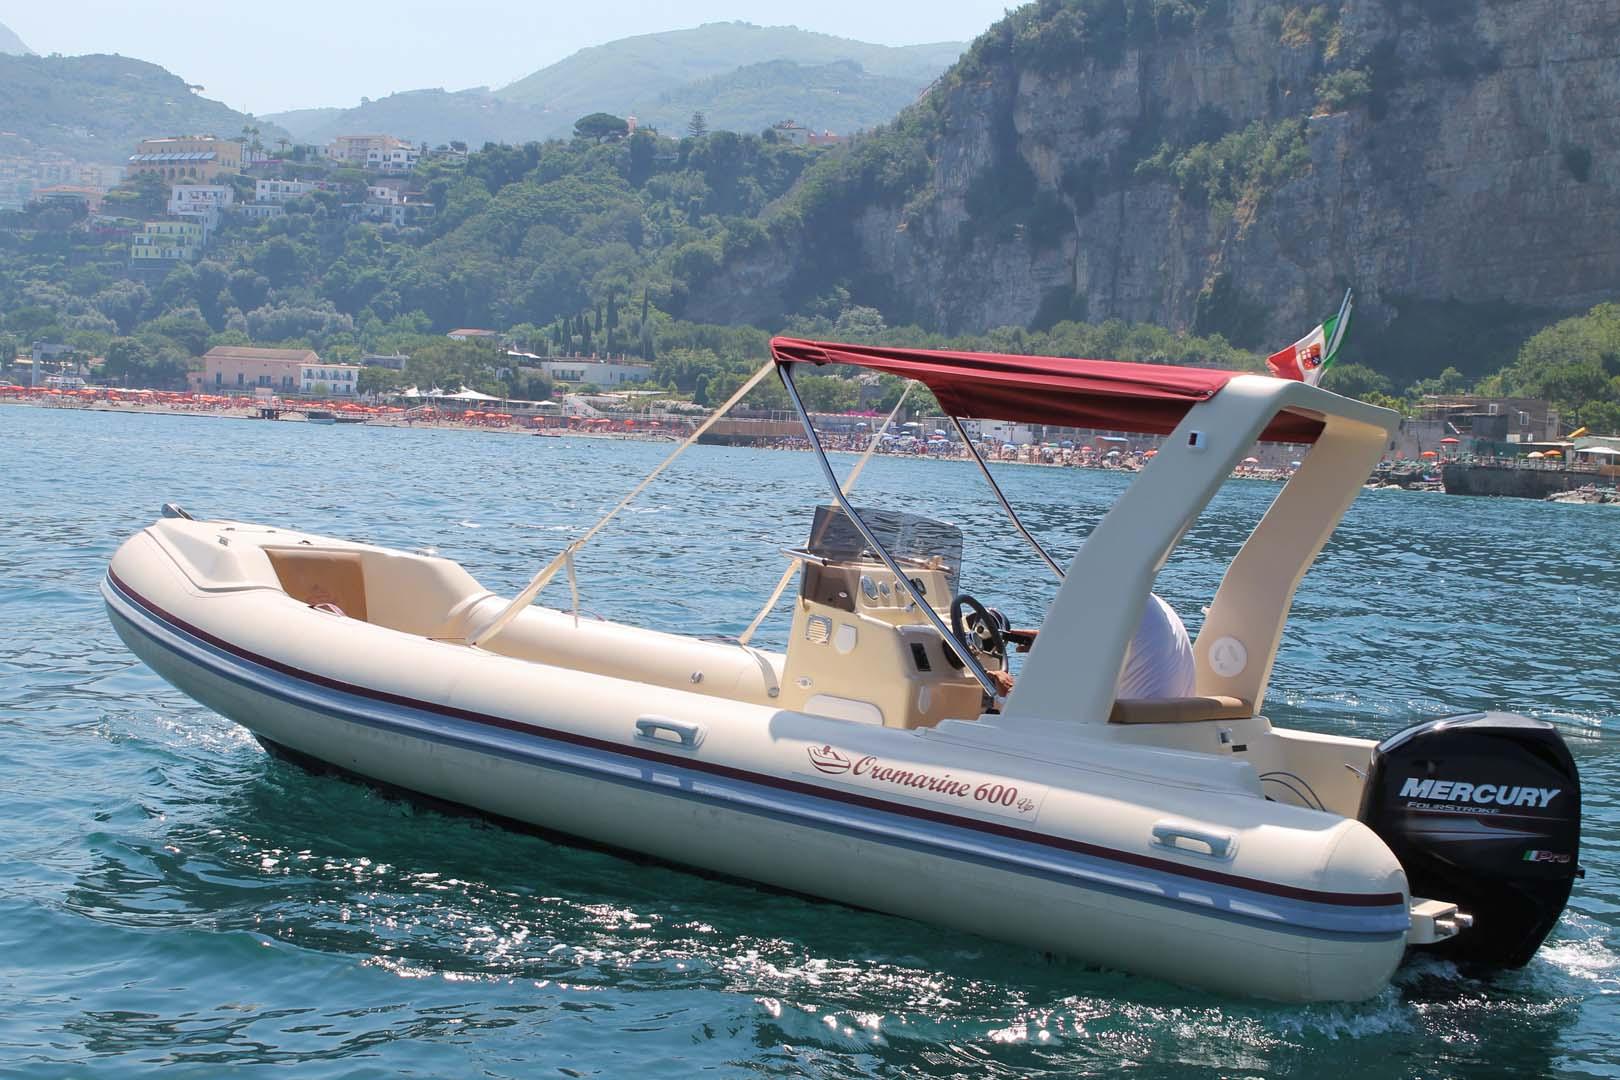 Positano sorrento capri noleggio gommone rental boat Oromarine 600 (2)